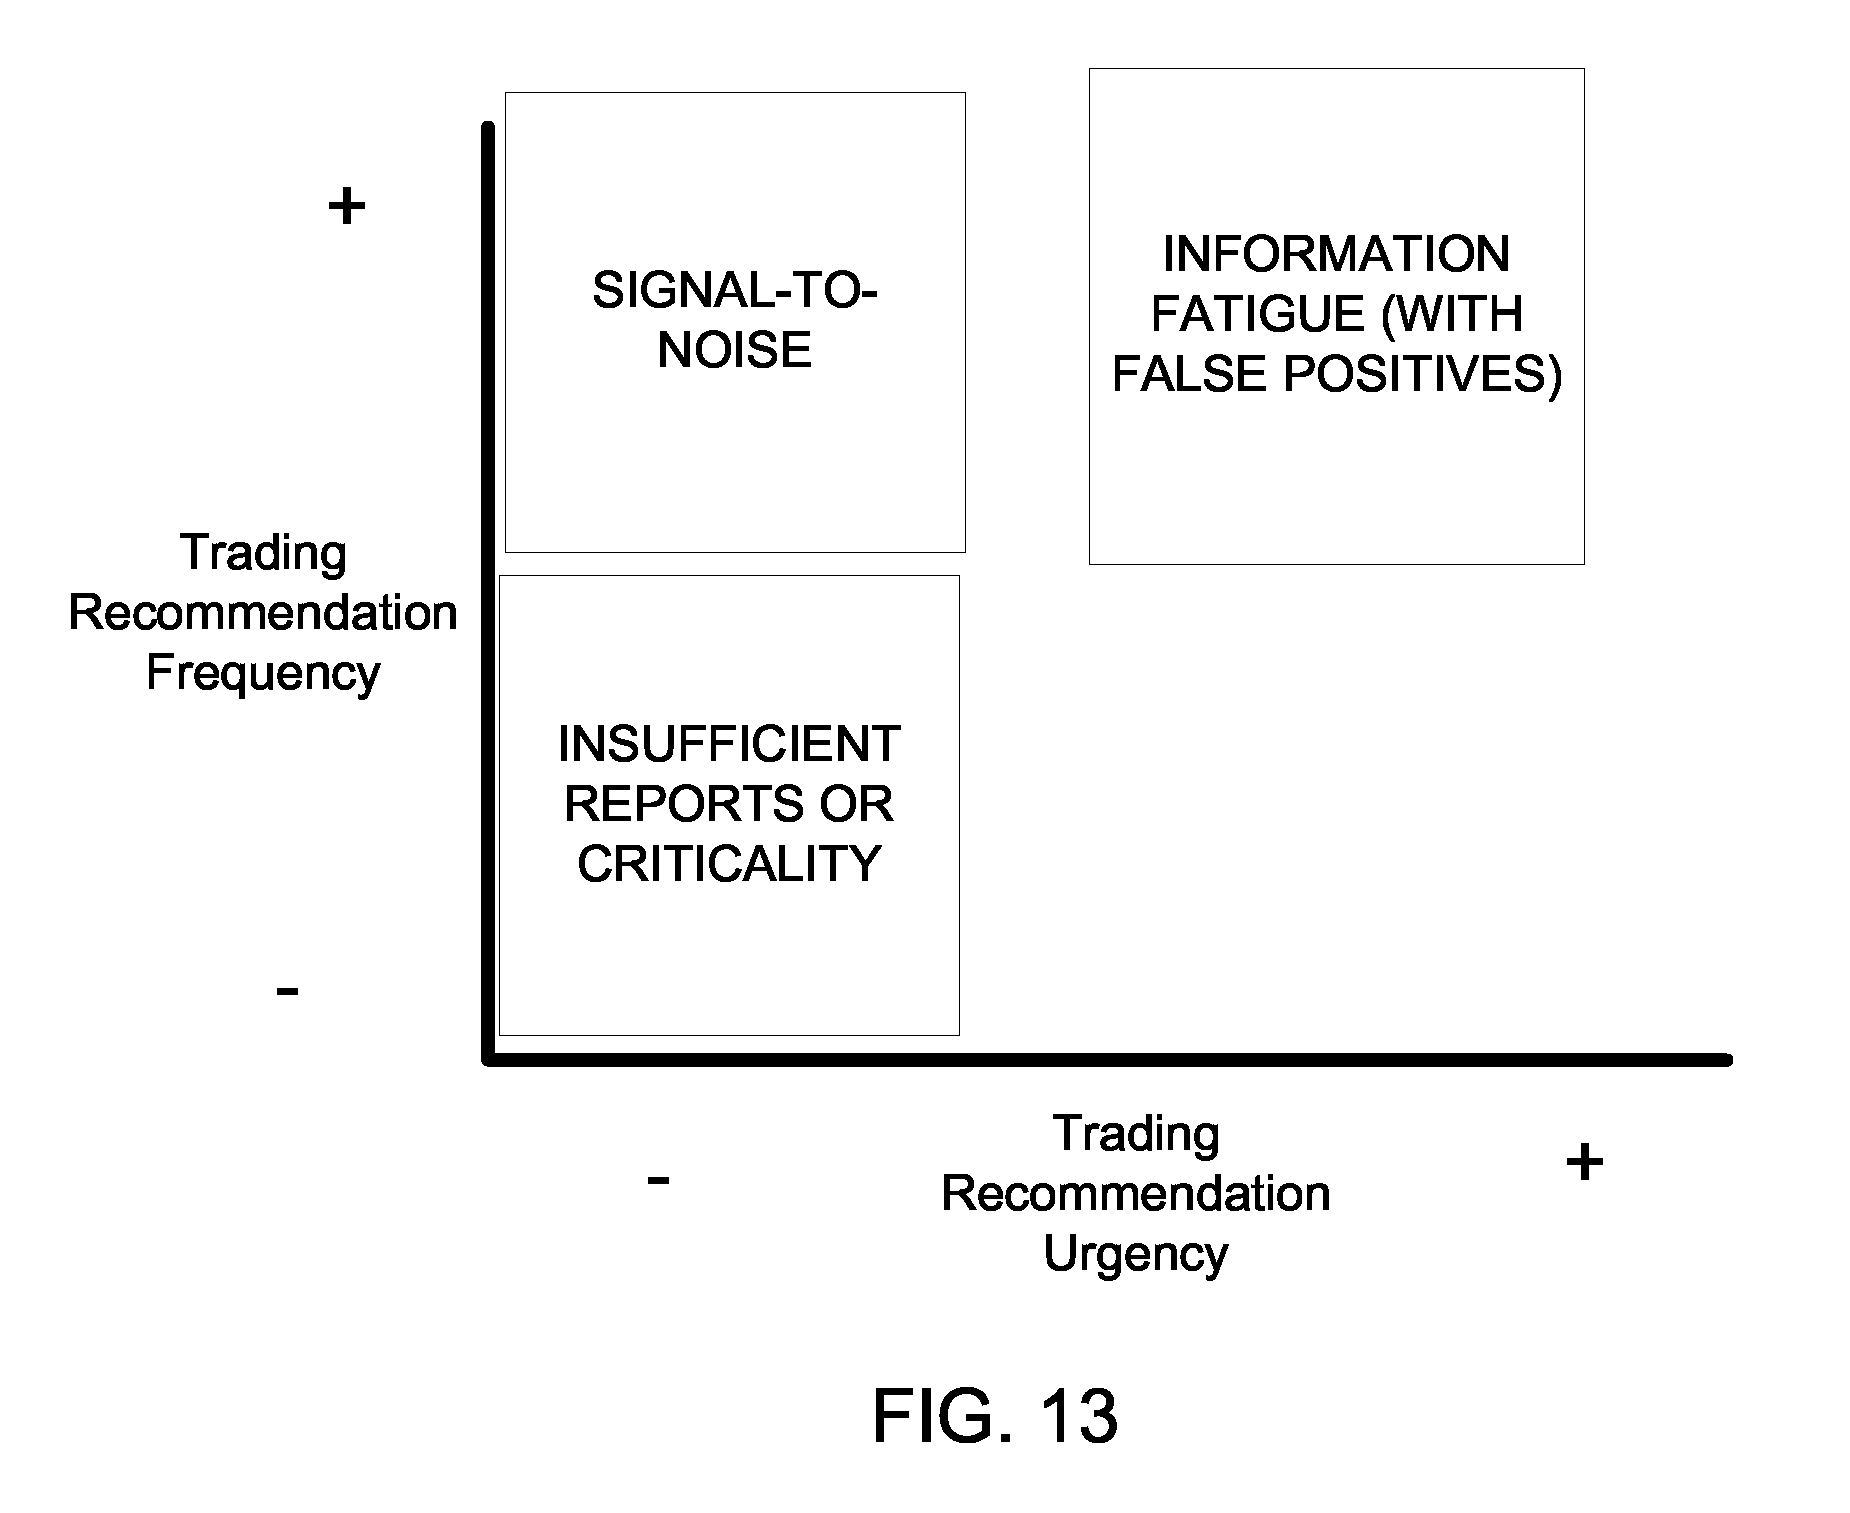 A fuzzy logic based trading system